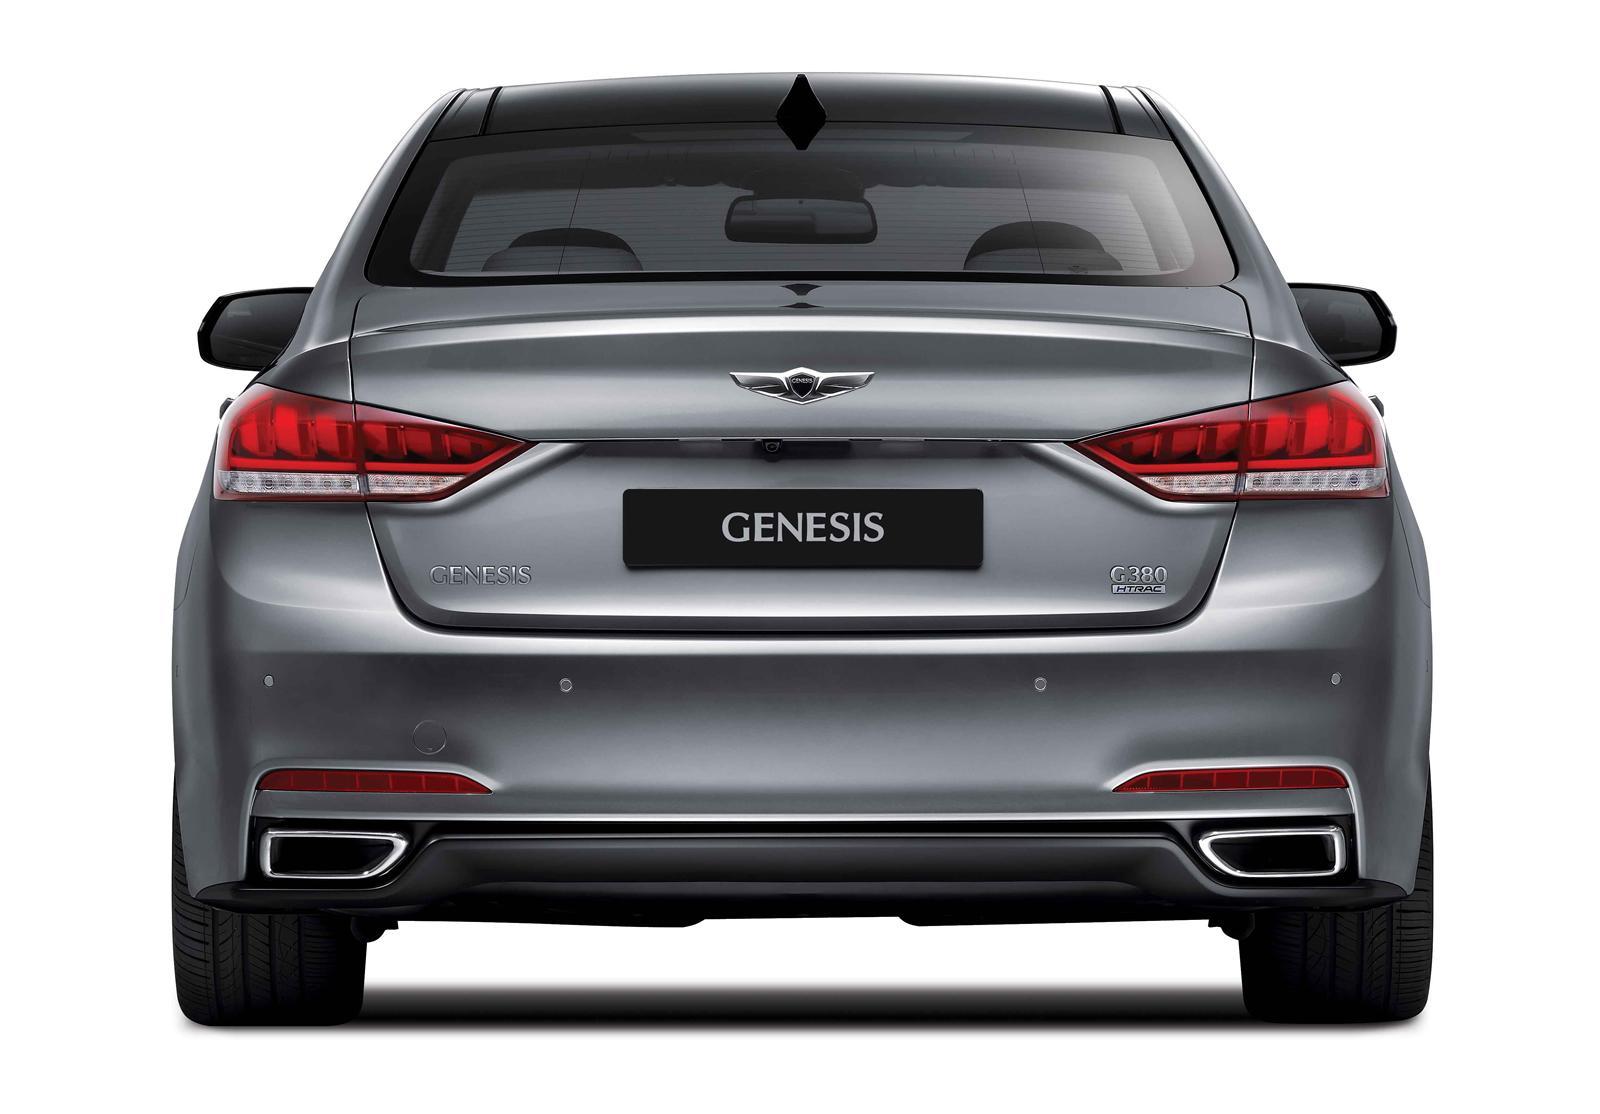 2015 Hyundai Genesis Rear Exterior Design